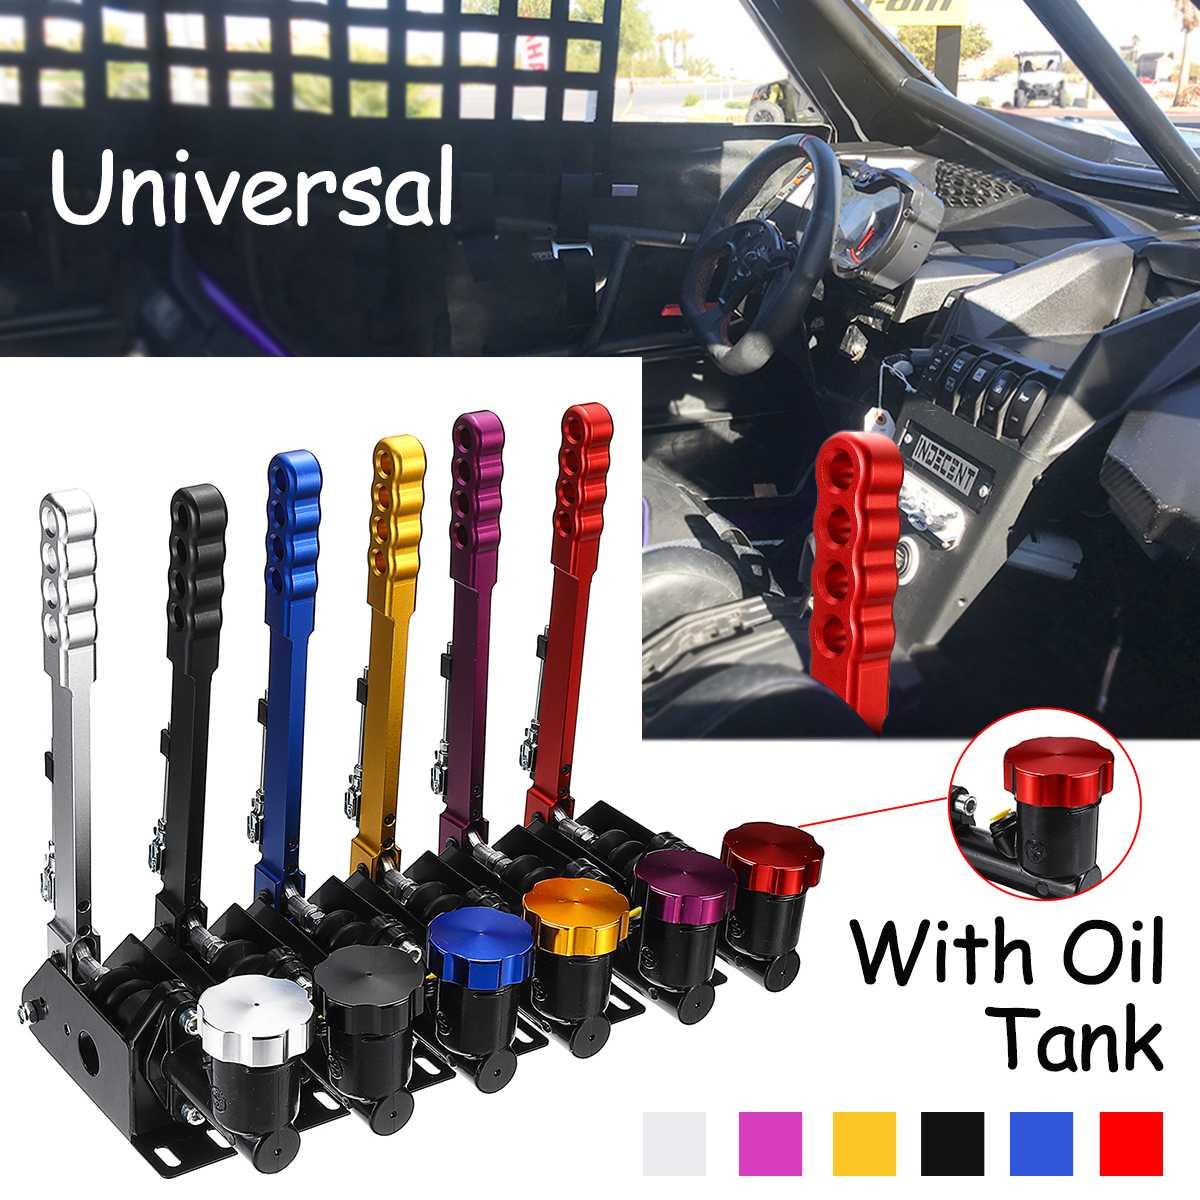 Adjustable Hydraulic Handbrake E-Brake Racing Handbrake Lever Vertical Professional Type with Oil Tank